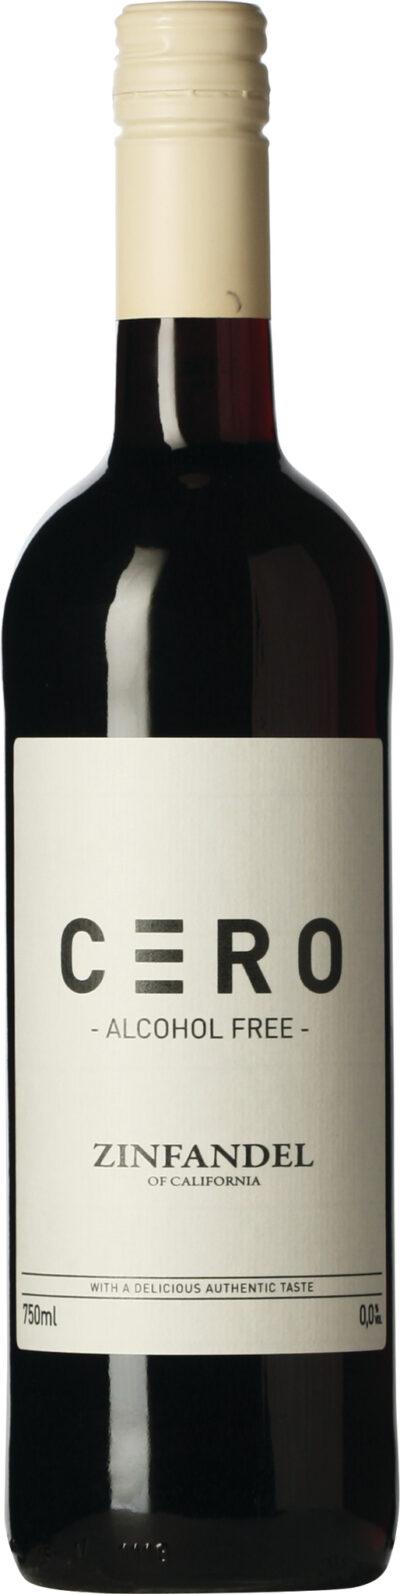 Cero Zinfandel 0%